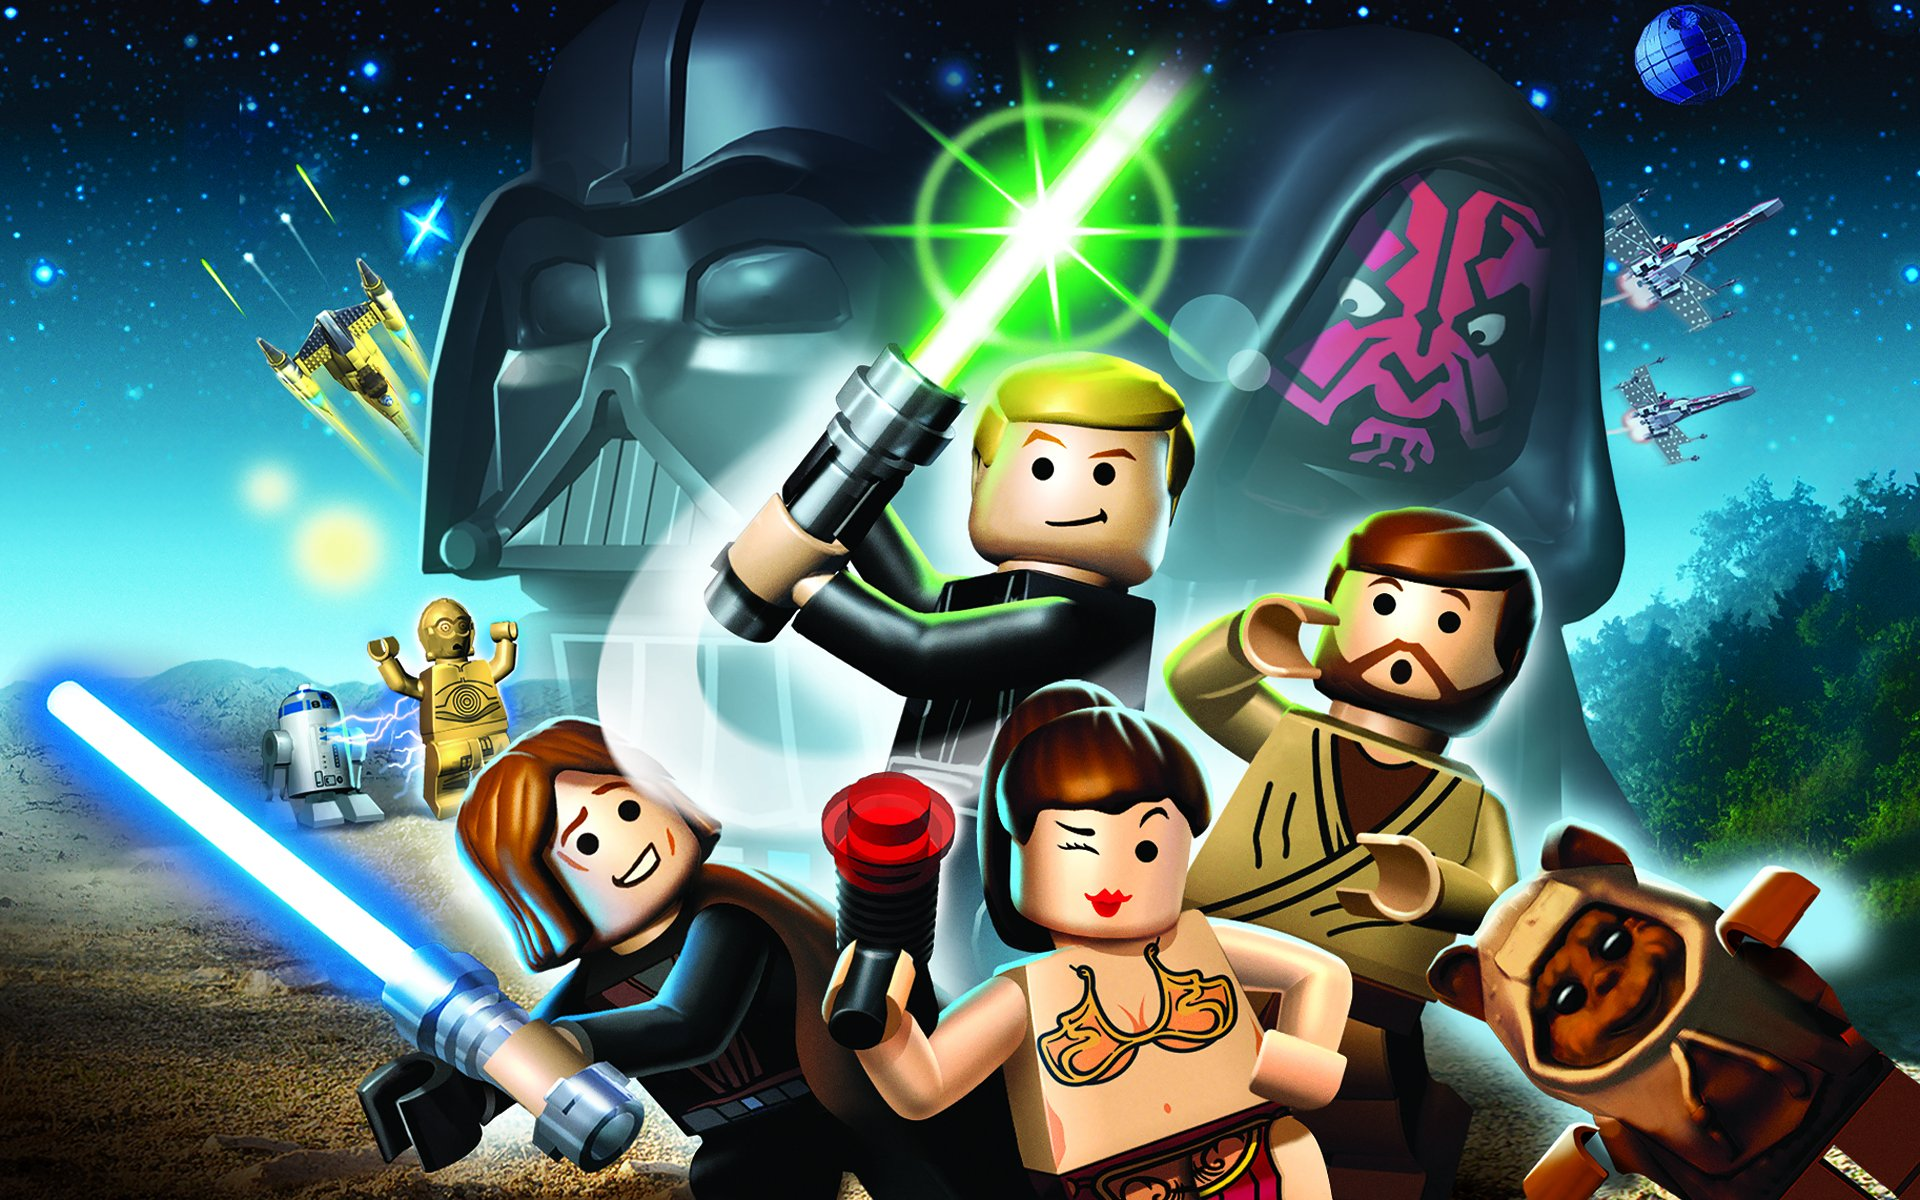 Lego star wars vs battles wiki fandom powered by wikia - Croiseur star wars lego ...